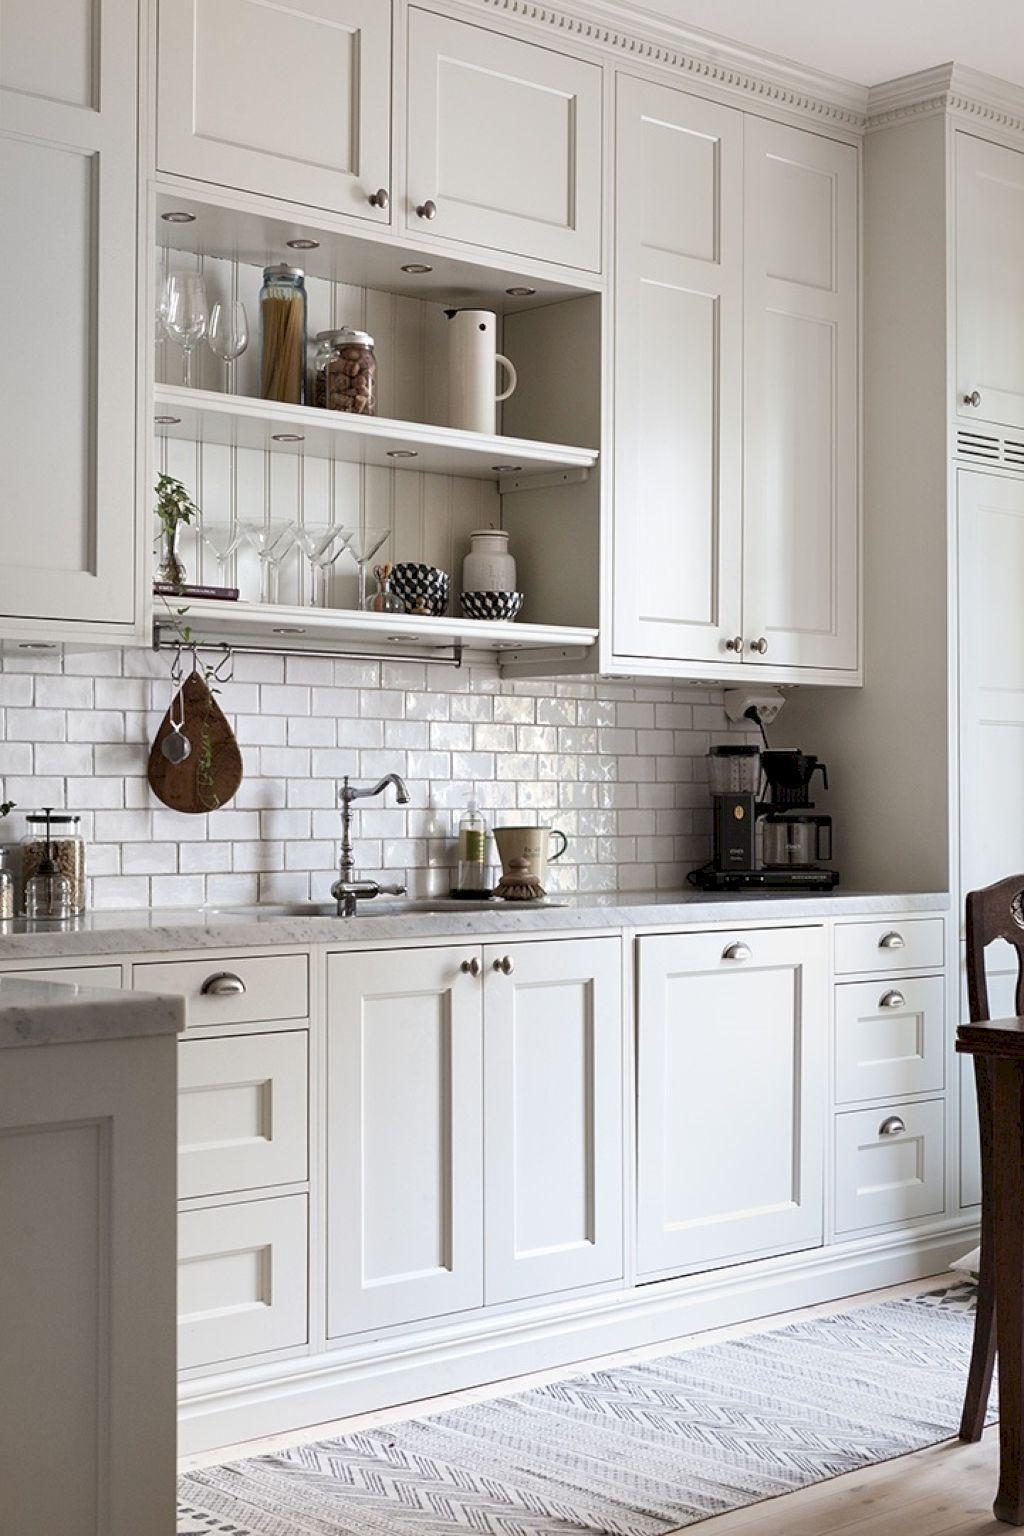 Small apartment kitchen ideas cocinas pequeñas pinterest